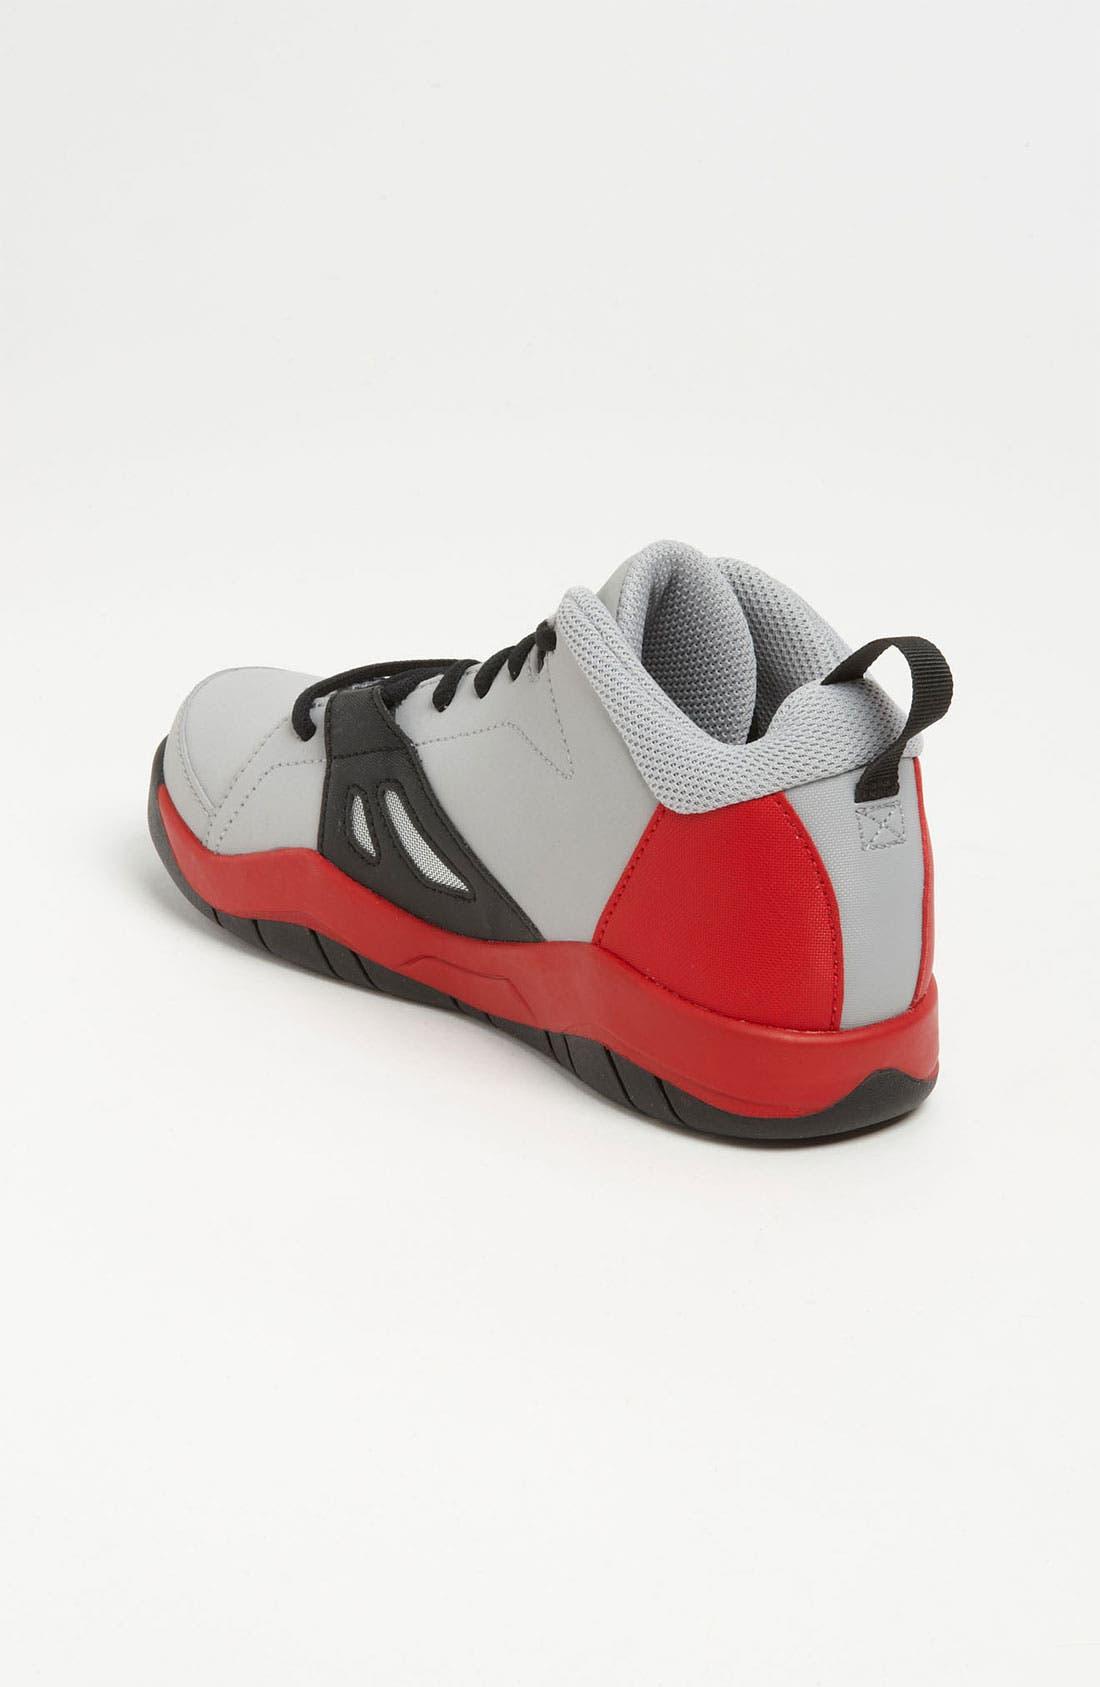 Alternate Image 2  - Nike 'Jordan Ace 23' Basketball Shoe (Toddler & Little Kid)